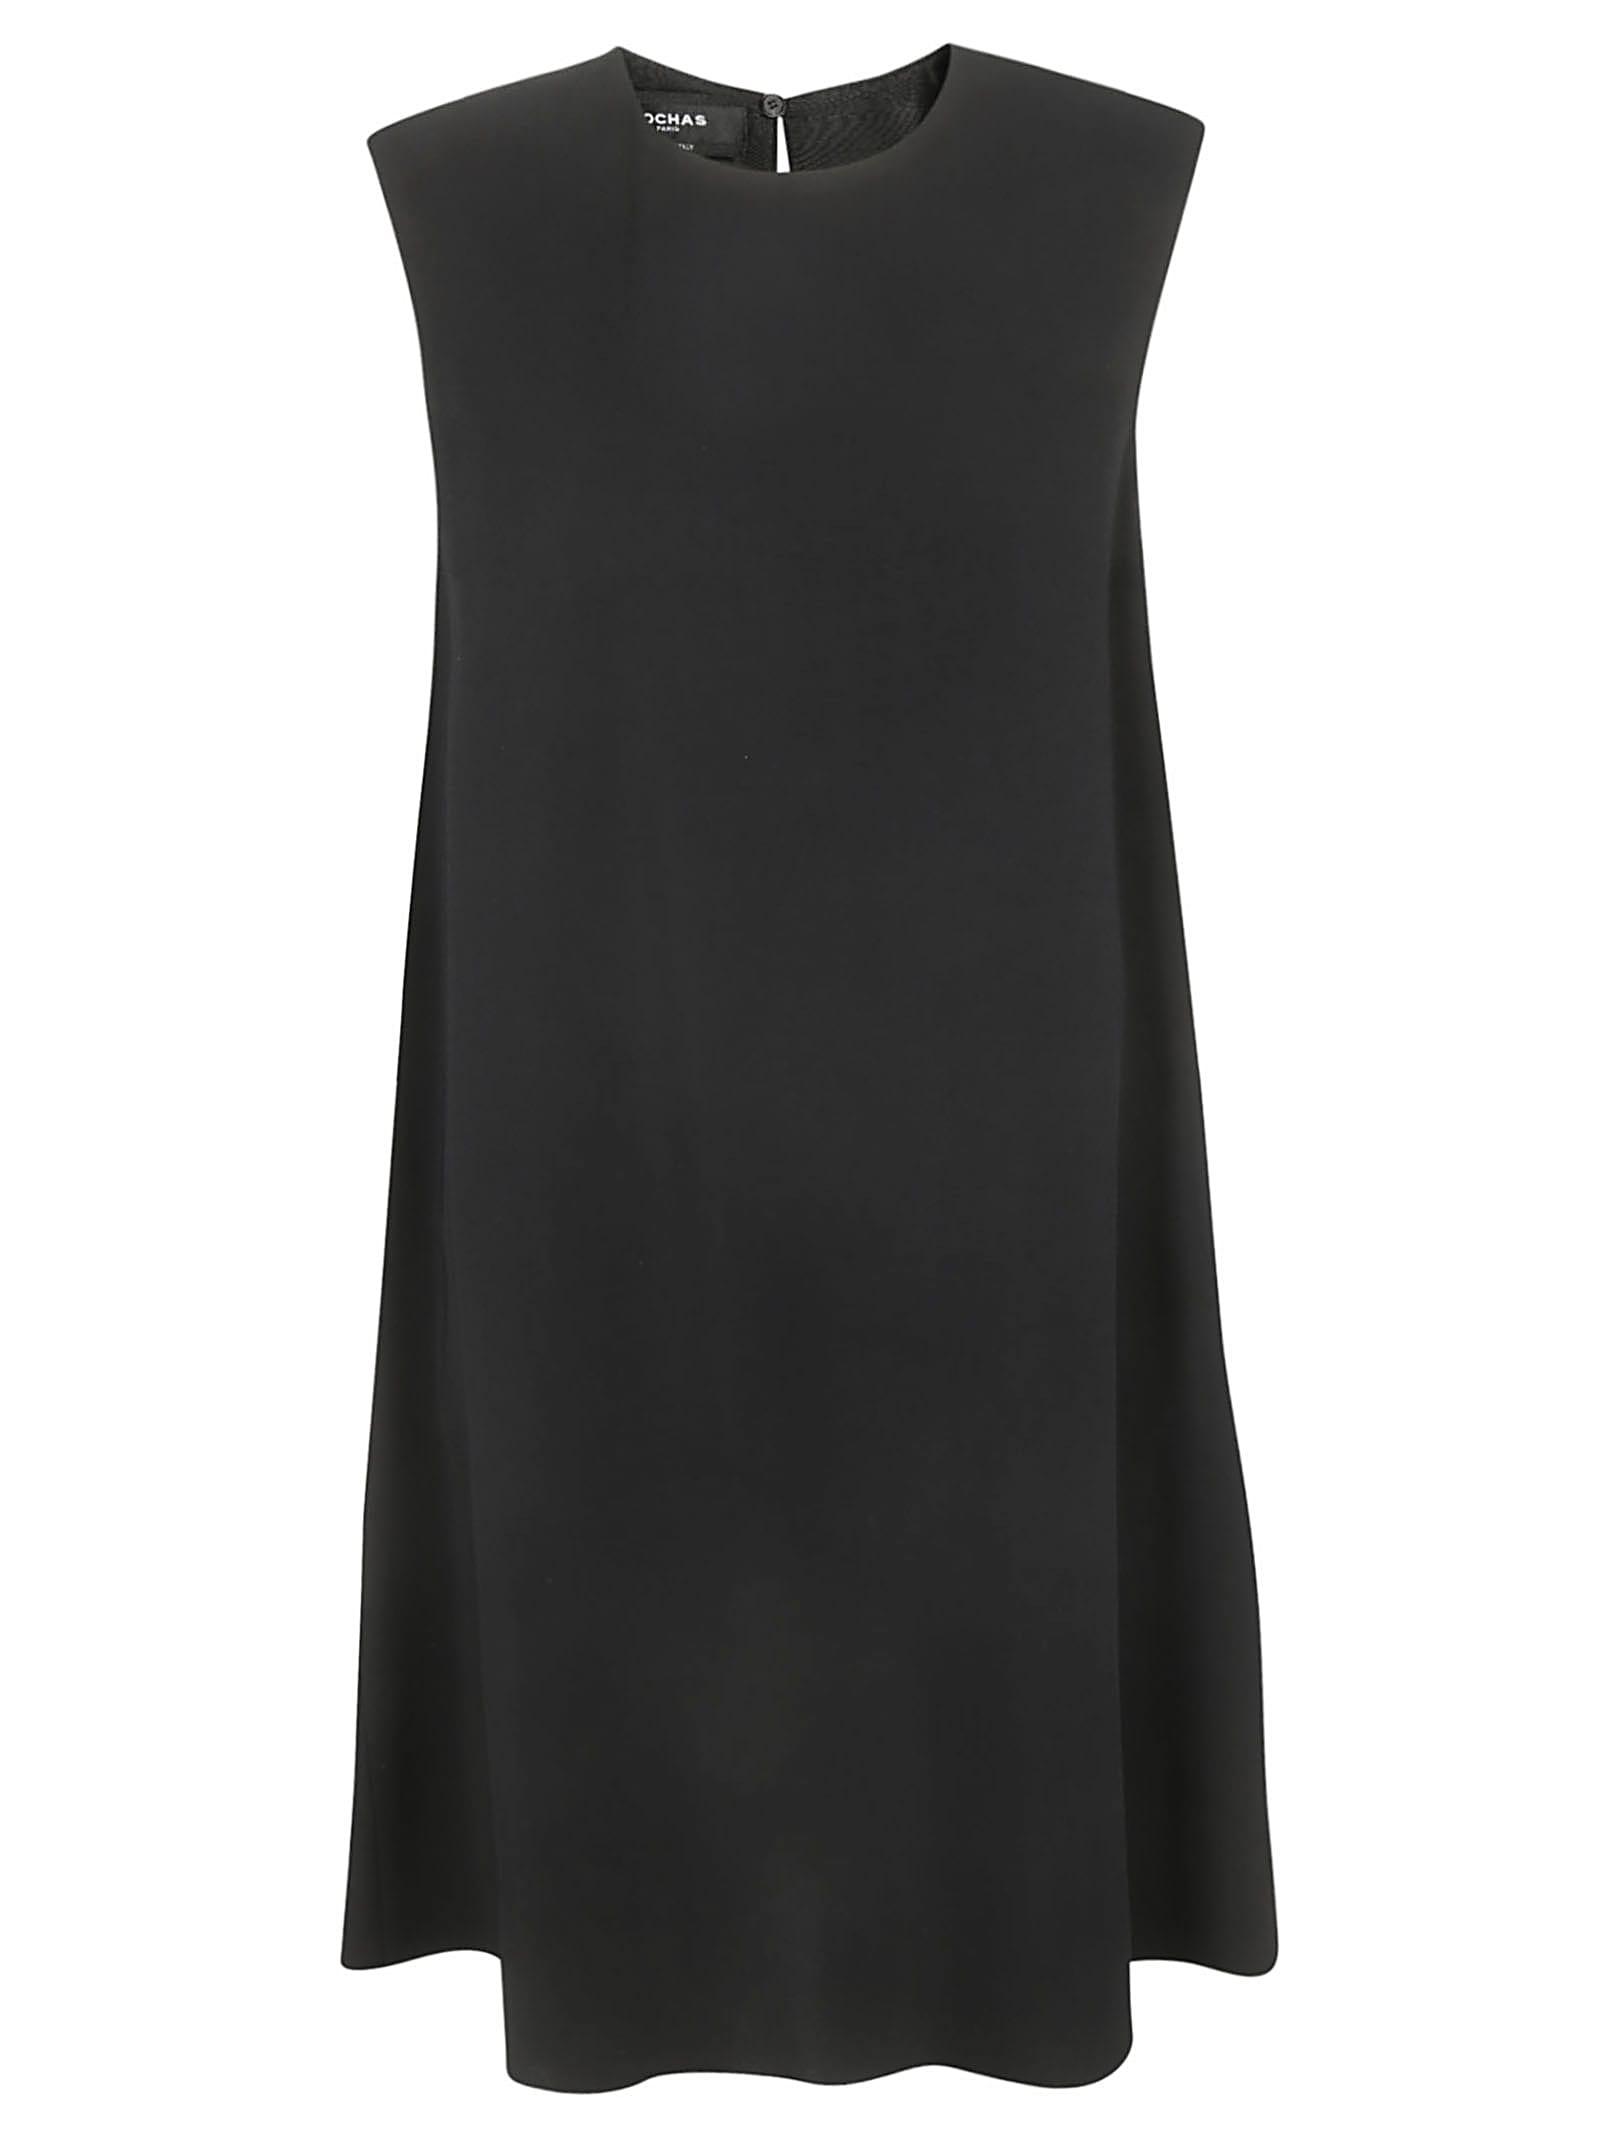 Rochas Classic Sleeveless Short Dress